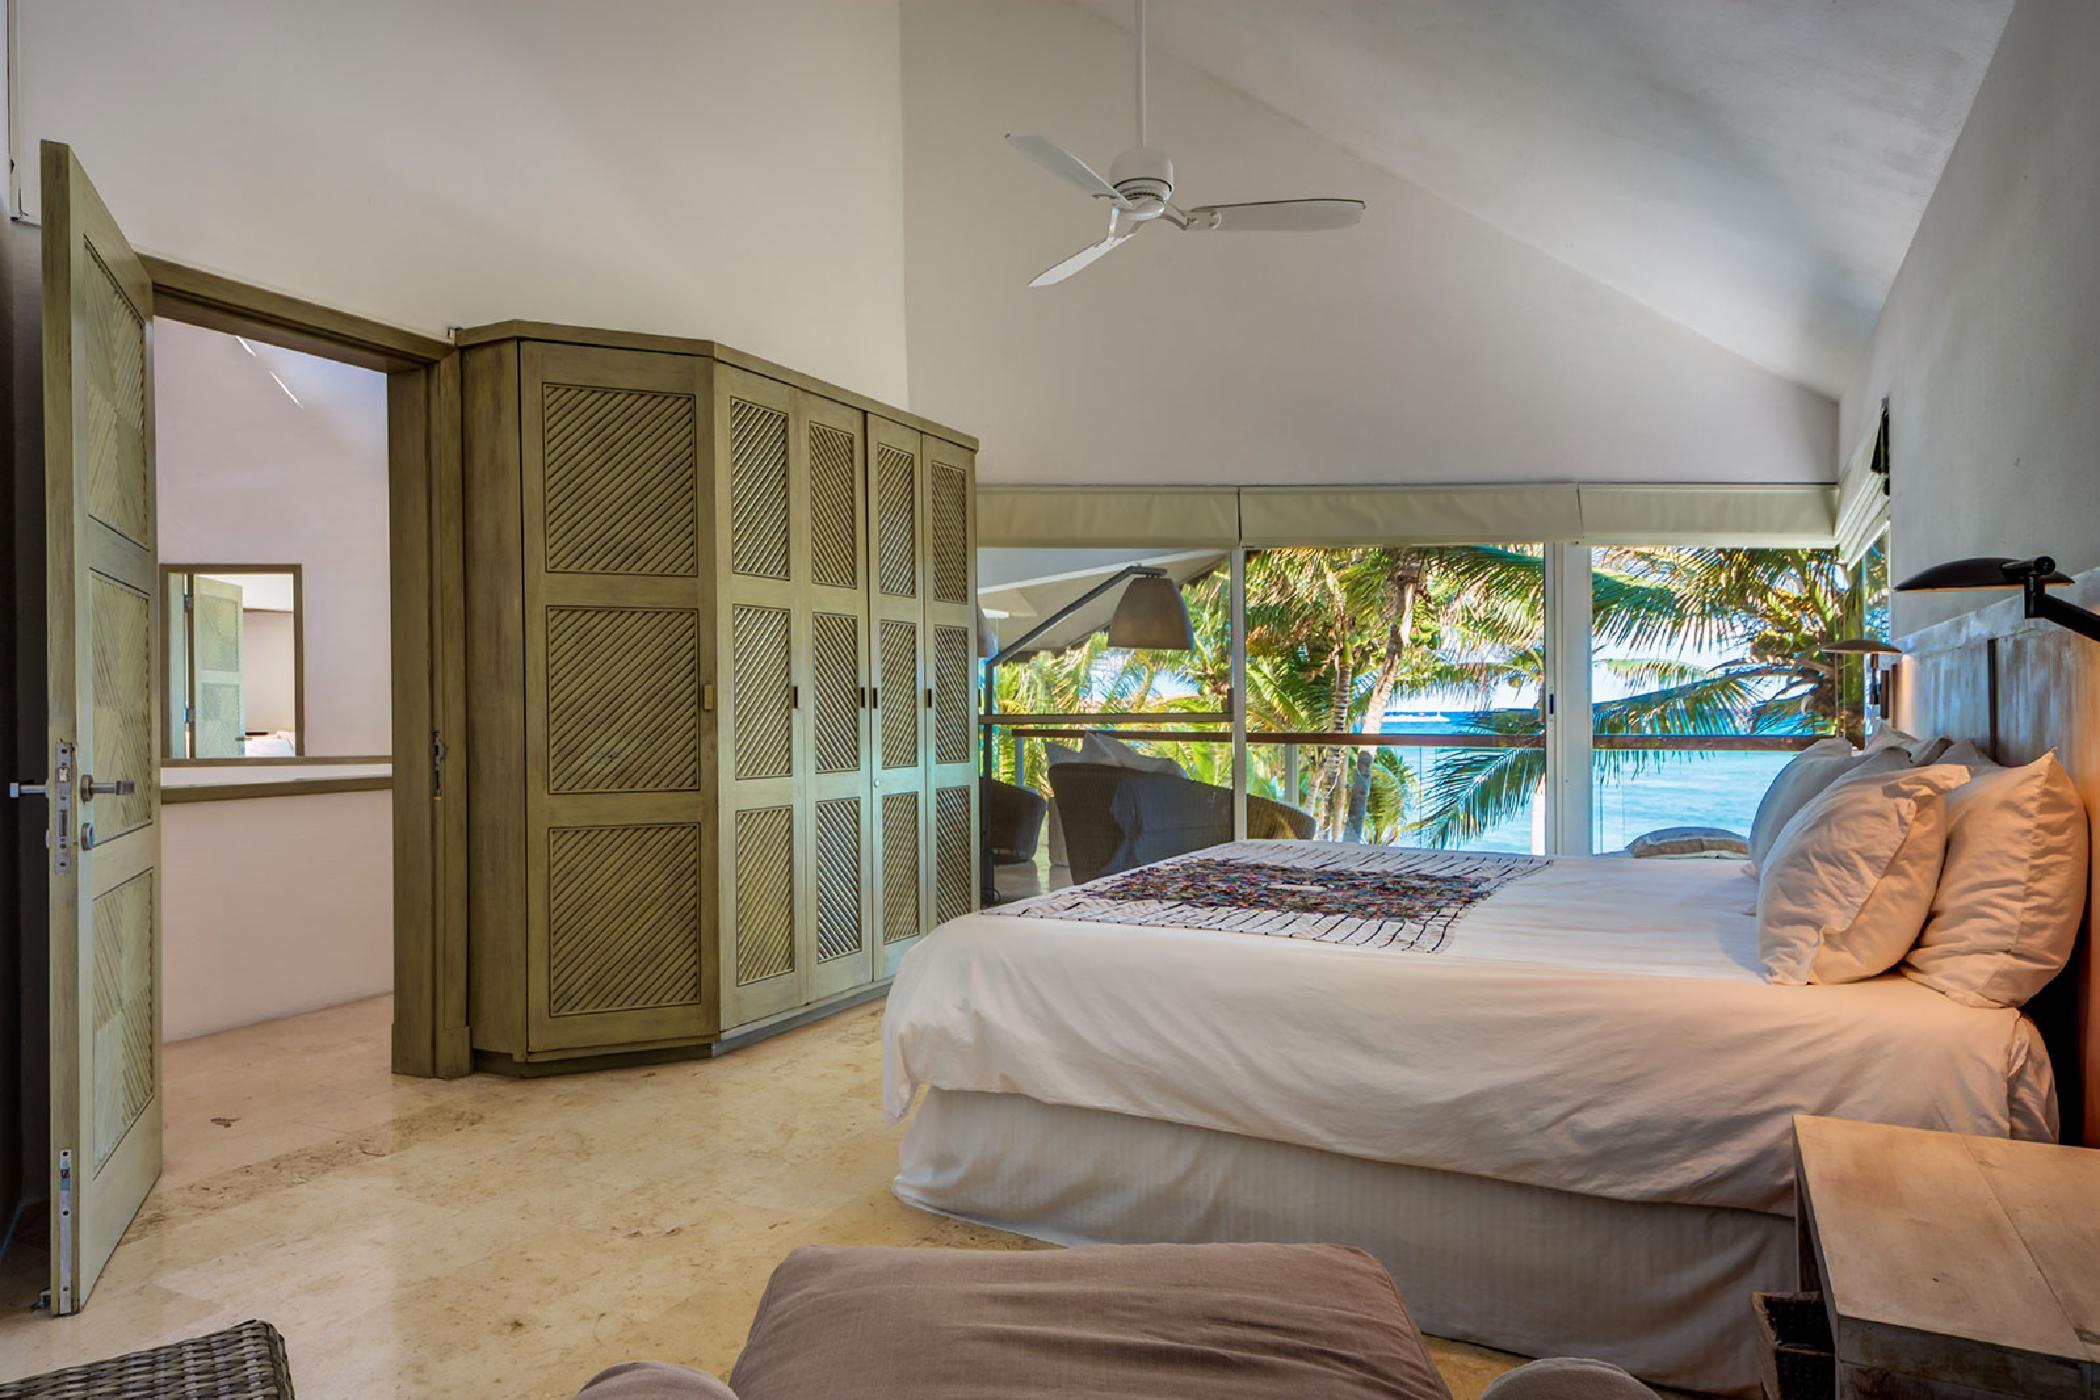 Maya_Luxe_Riviera_Maya_Luxury_Villas_Experiences_Puerto_Aventuras_5_Bedrooms_Zacil_Na_15.jpg